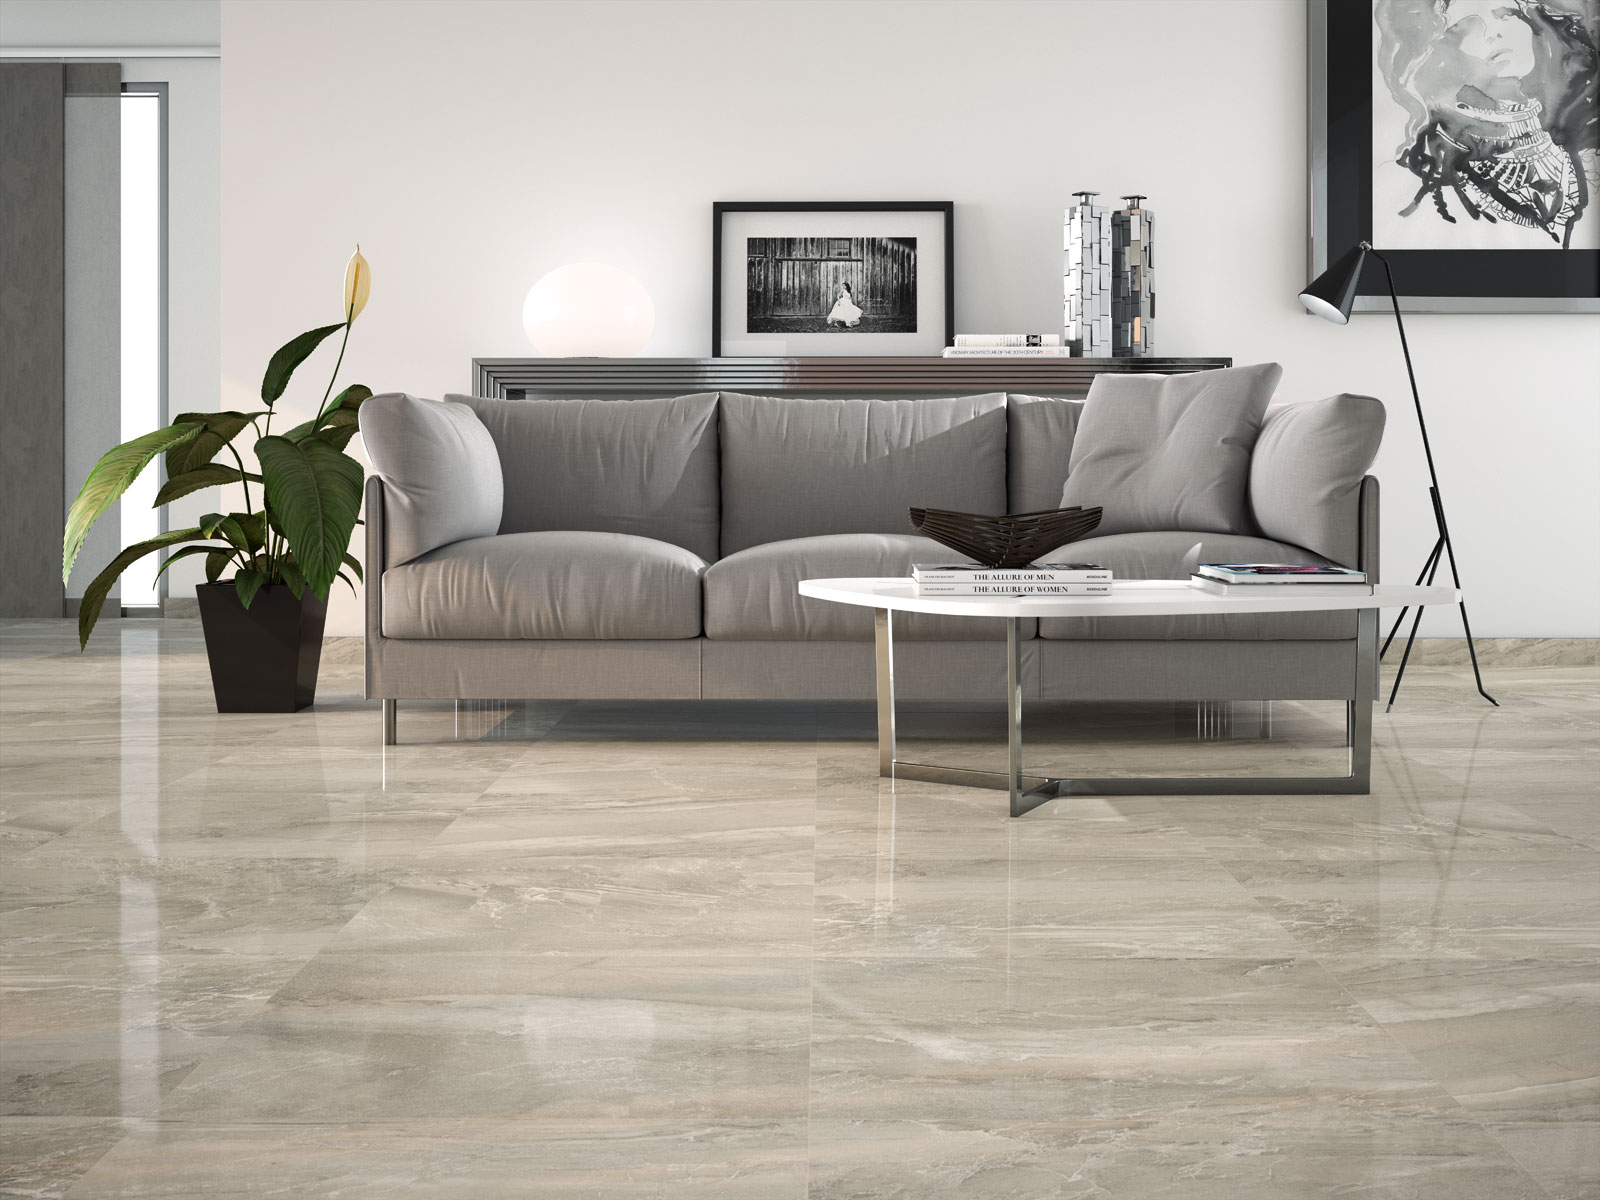 Lithos gres effetto marmo marazzi - Piastrelle in marmo ...